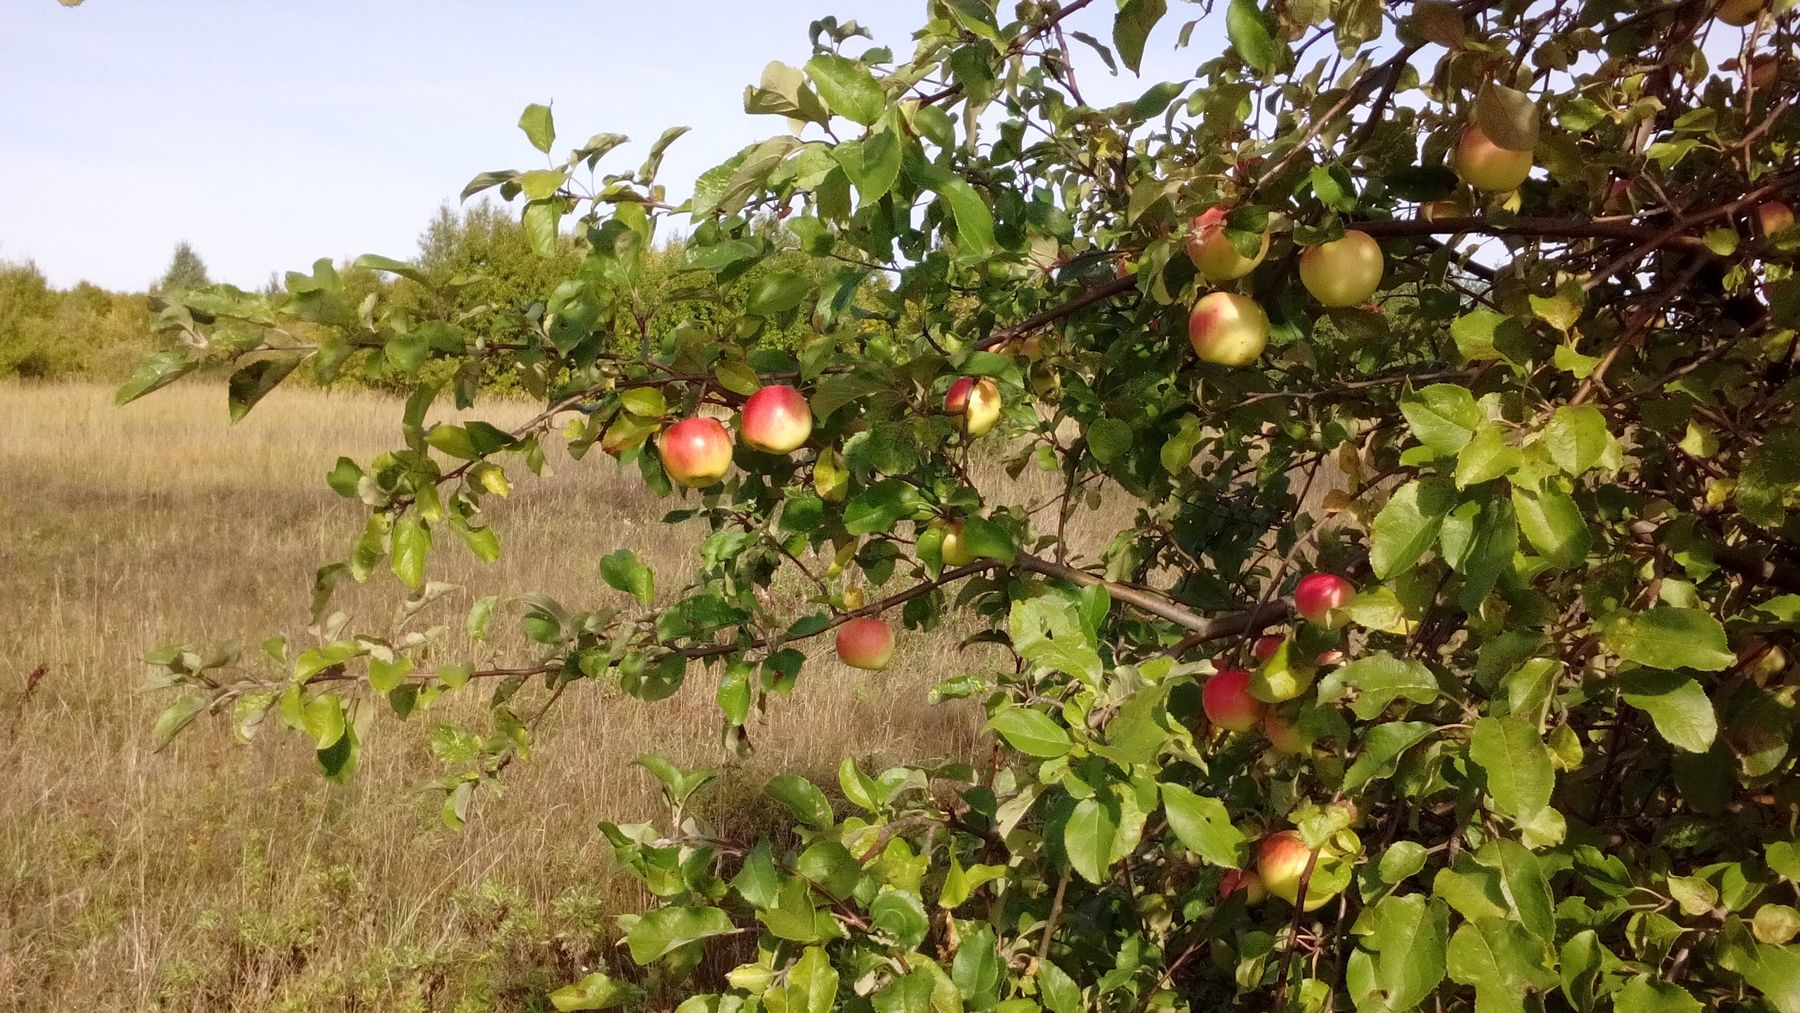 Яблоня у дороги яблоня дичек яблоки у дороги природа